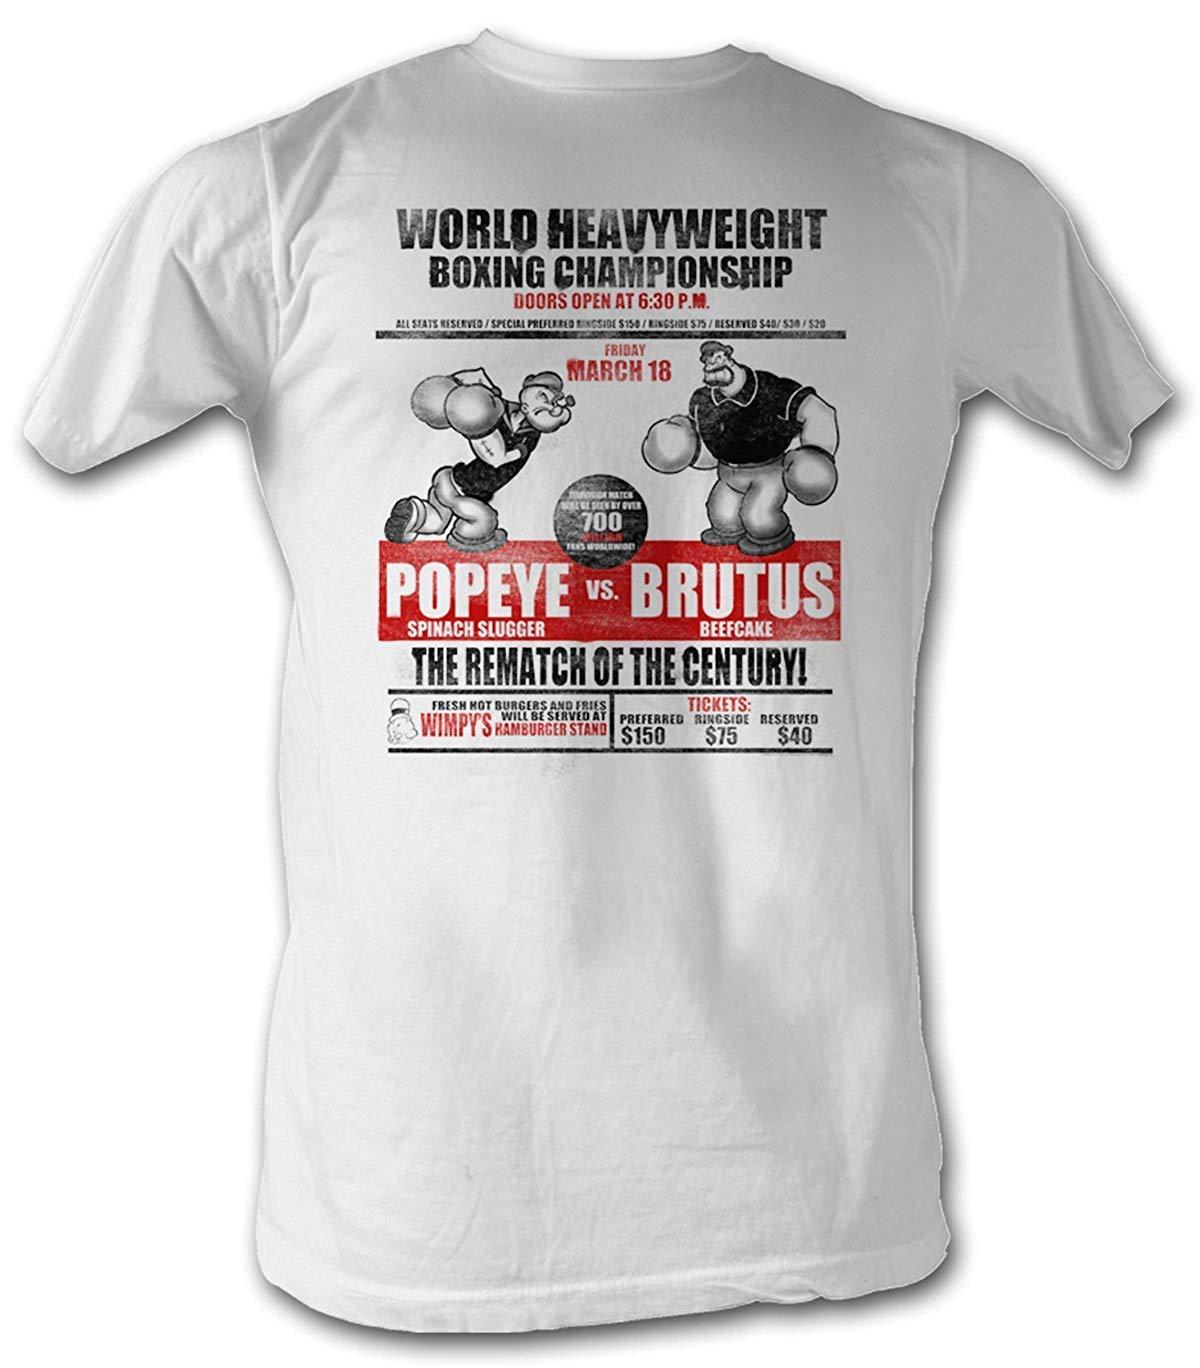 A E Designs Popeye T Shirt Heavyweight Boxing Championship Adult T